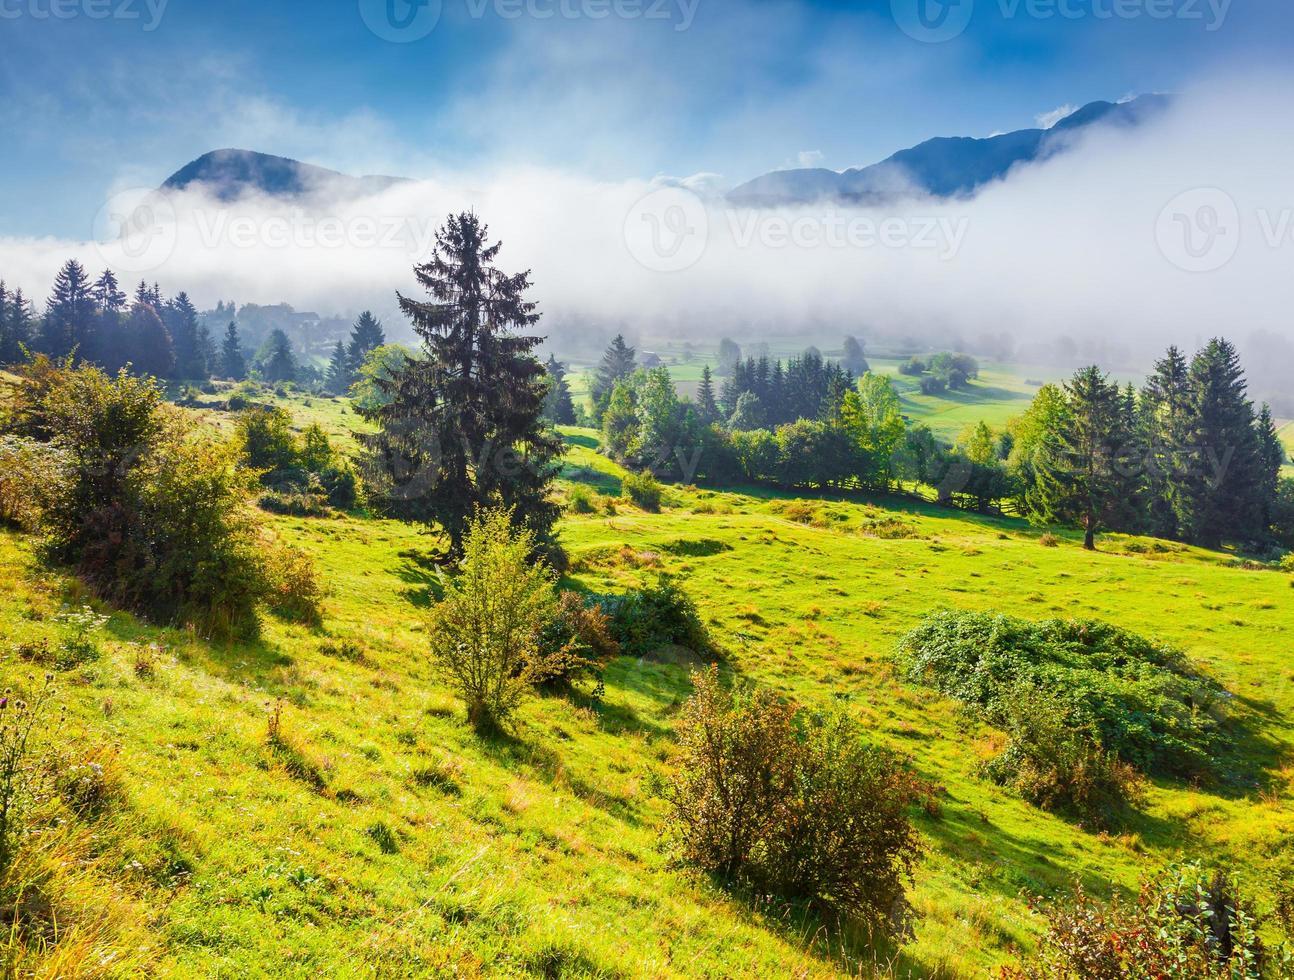 Foggy summer morning in the Triglav national park photo